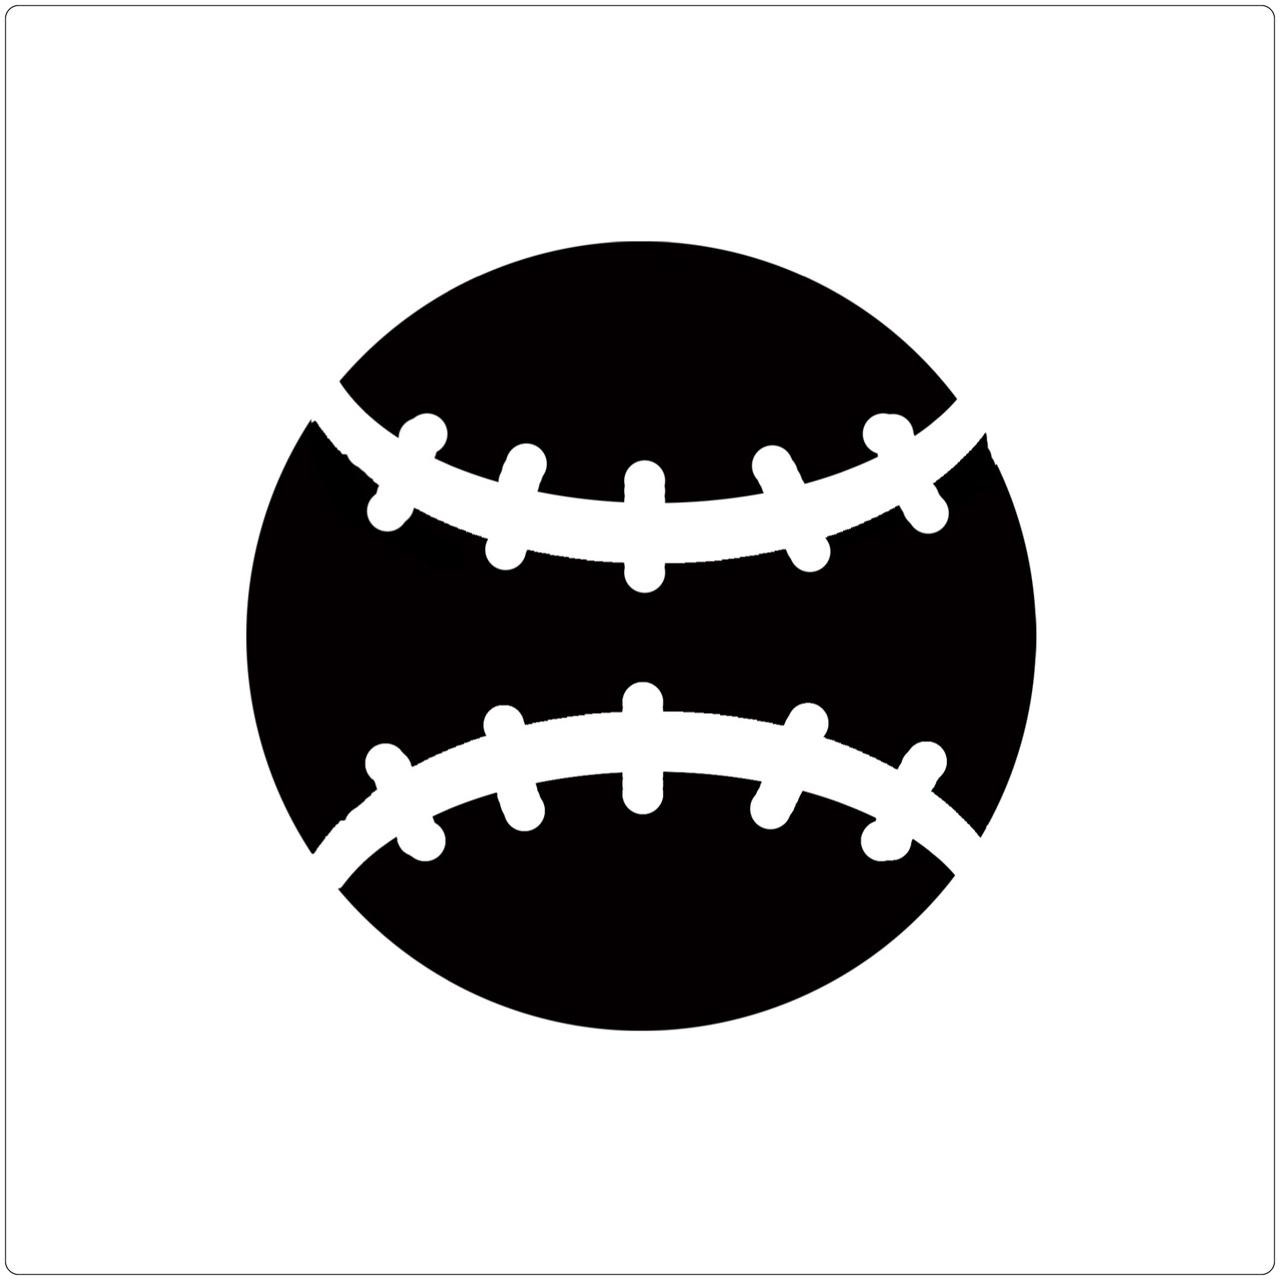 Baseball Professional Stencil Insert